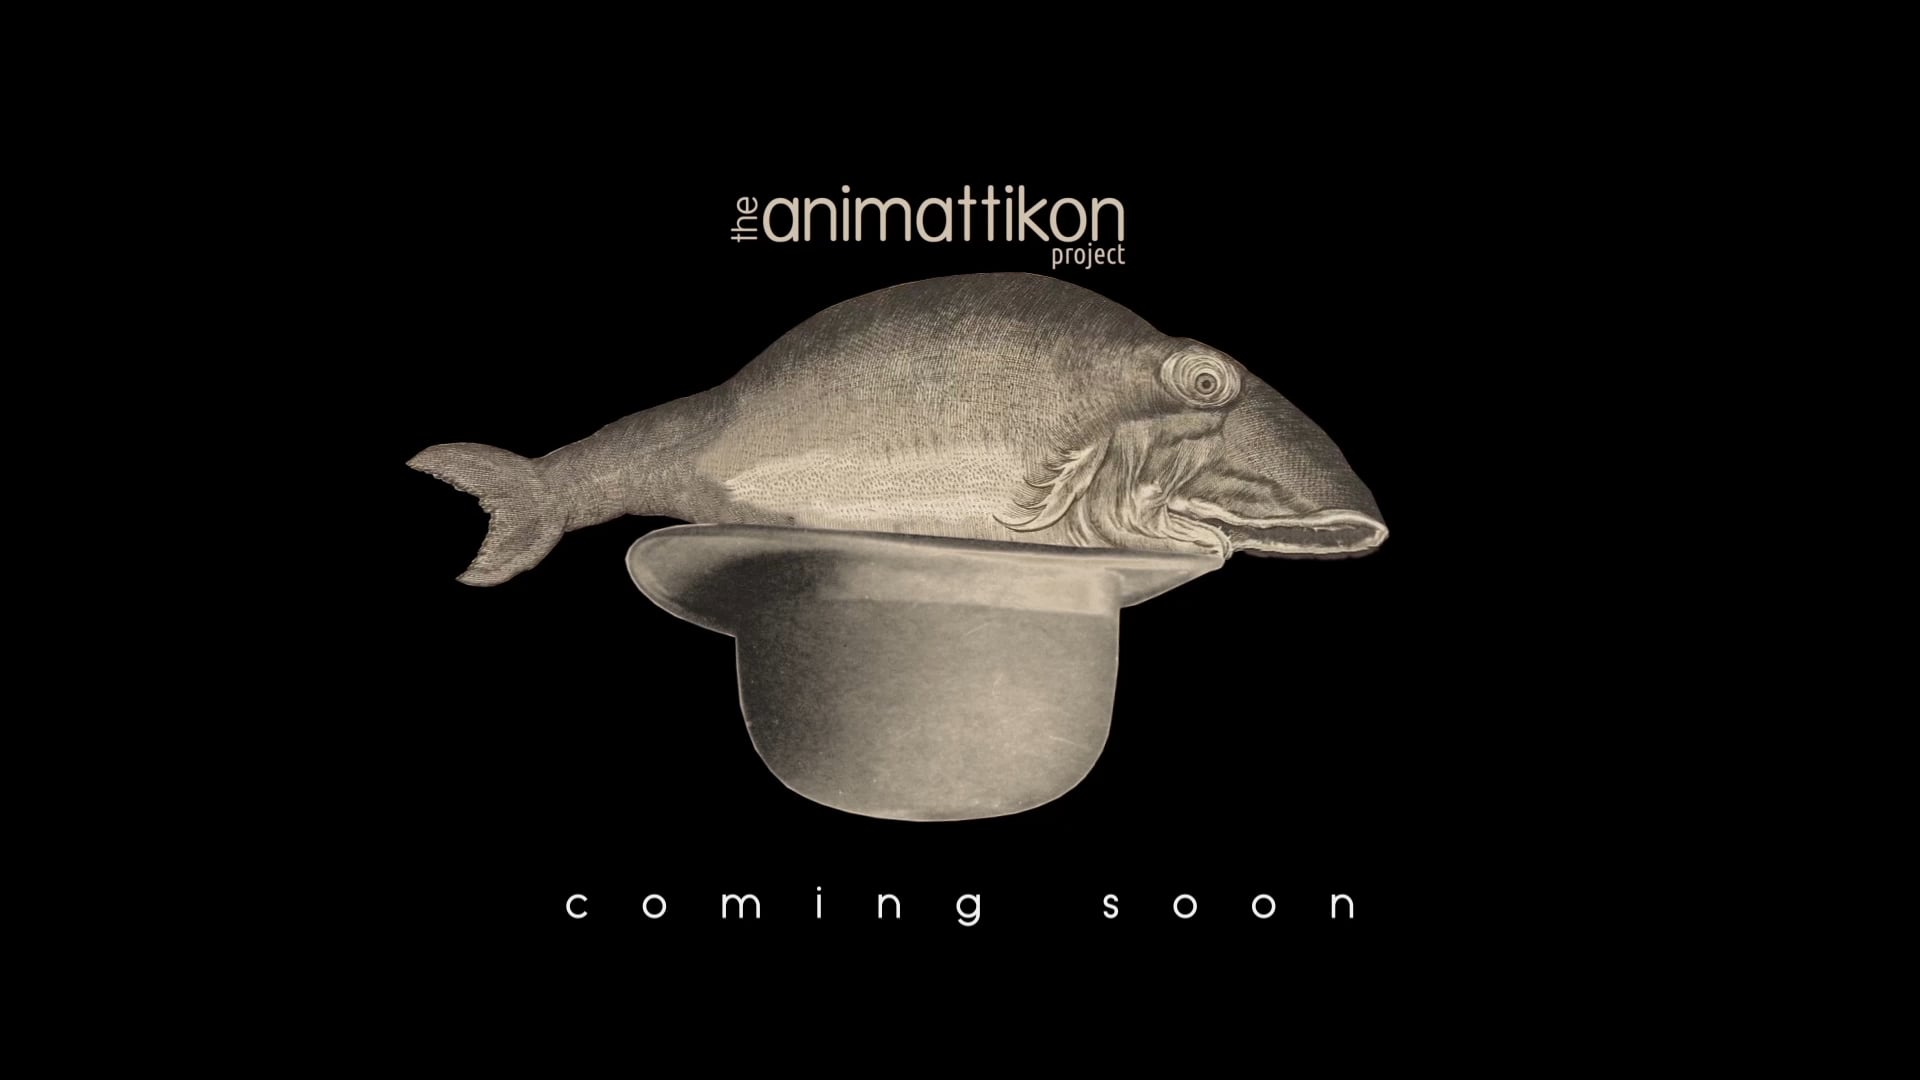 The Animattikon Project / Coming Soon